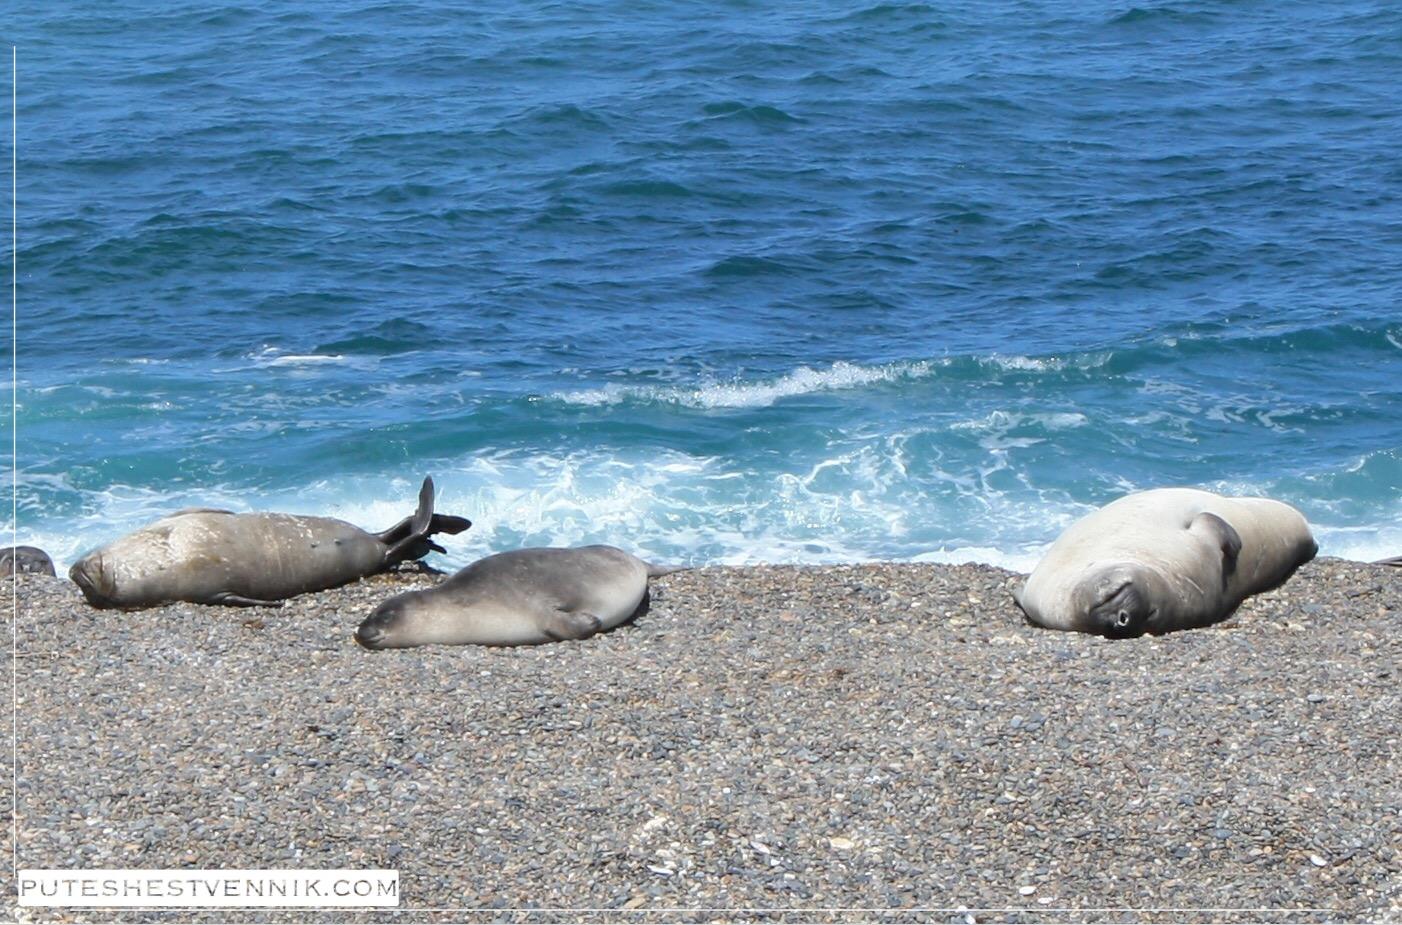 Морские животные на берегу Атлантического океана